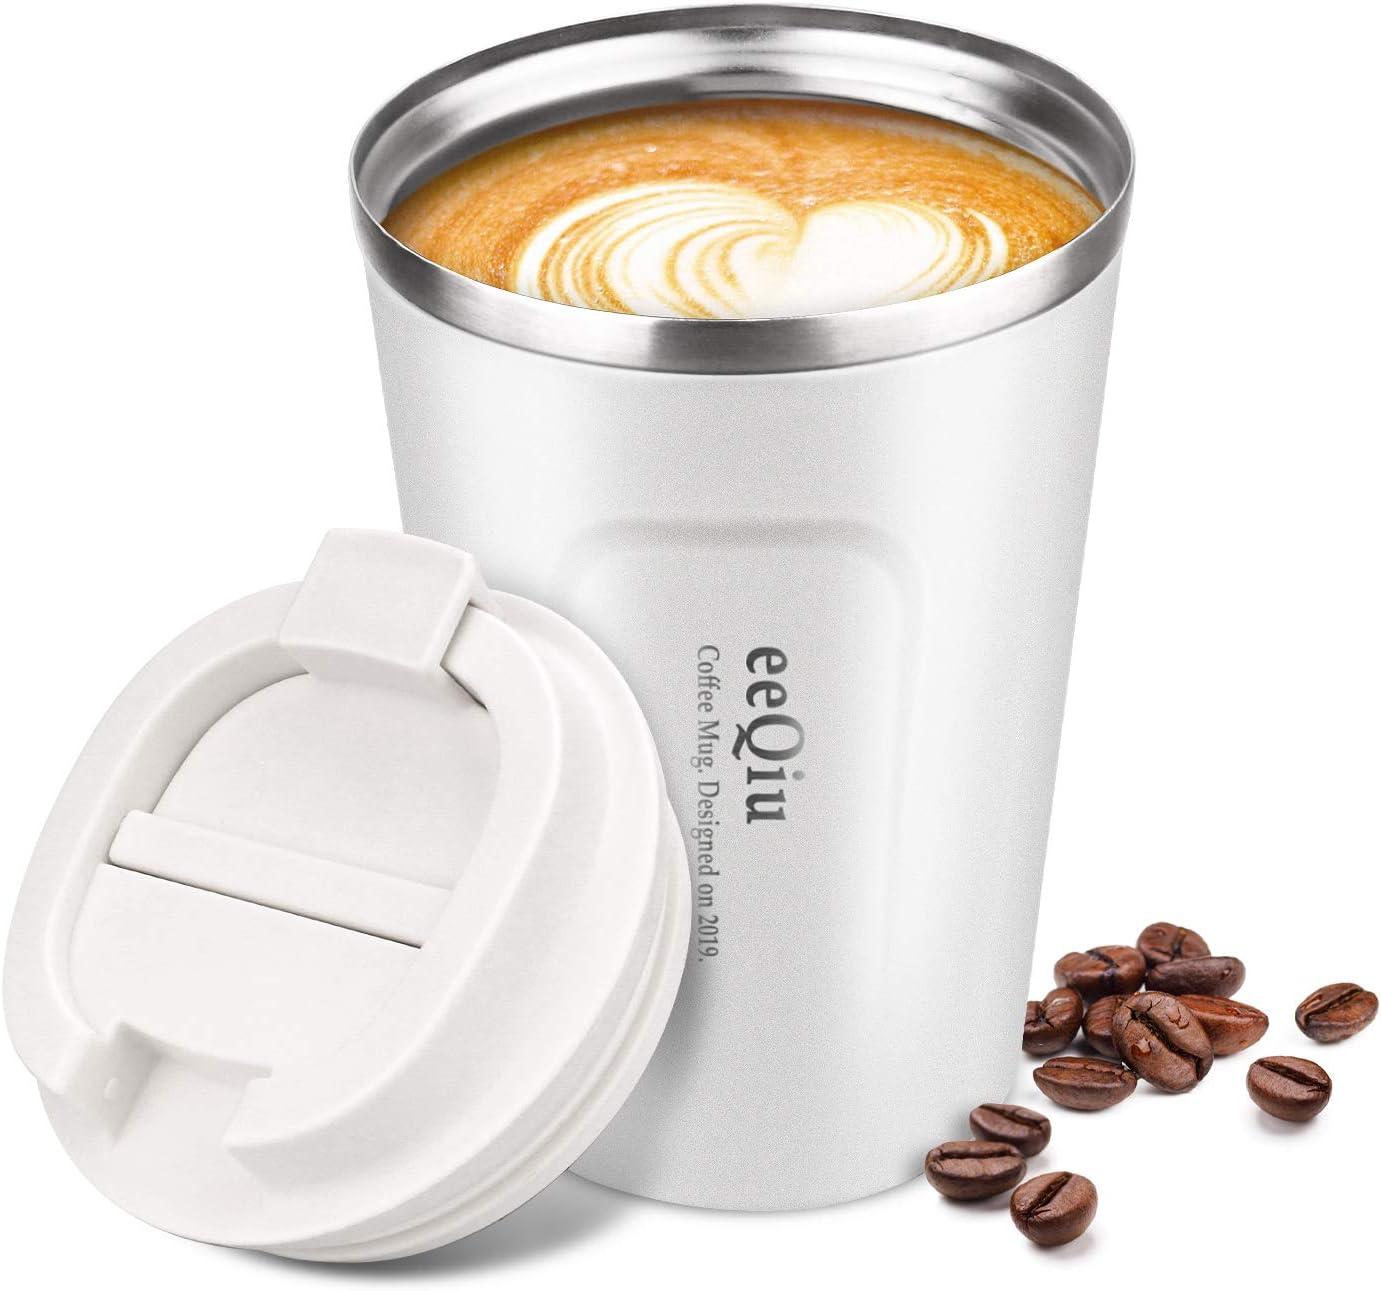 Taza de café reutilizable, taza de viaje de 13 oz hecha de acero inoxidable con aislamiento de doble pared Tapa 100% a prueba de fugas Tapa de automóvil ecológica para café, té y cerveza (blanco)